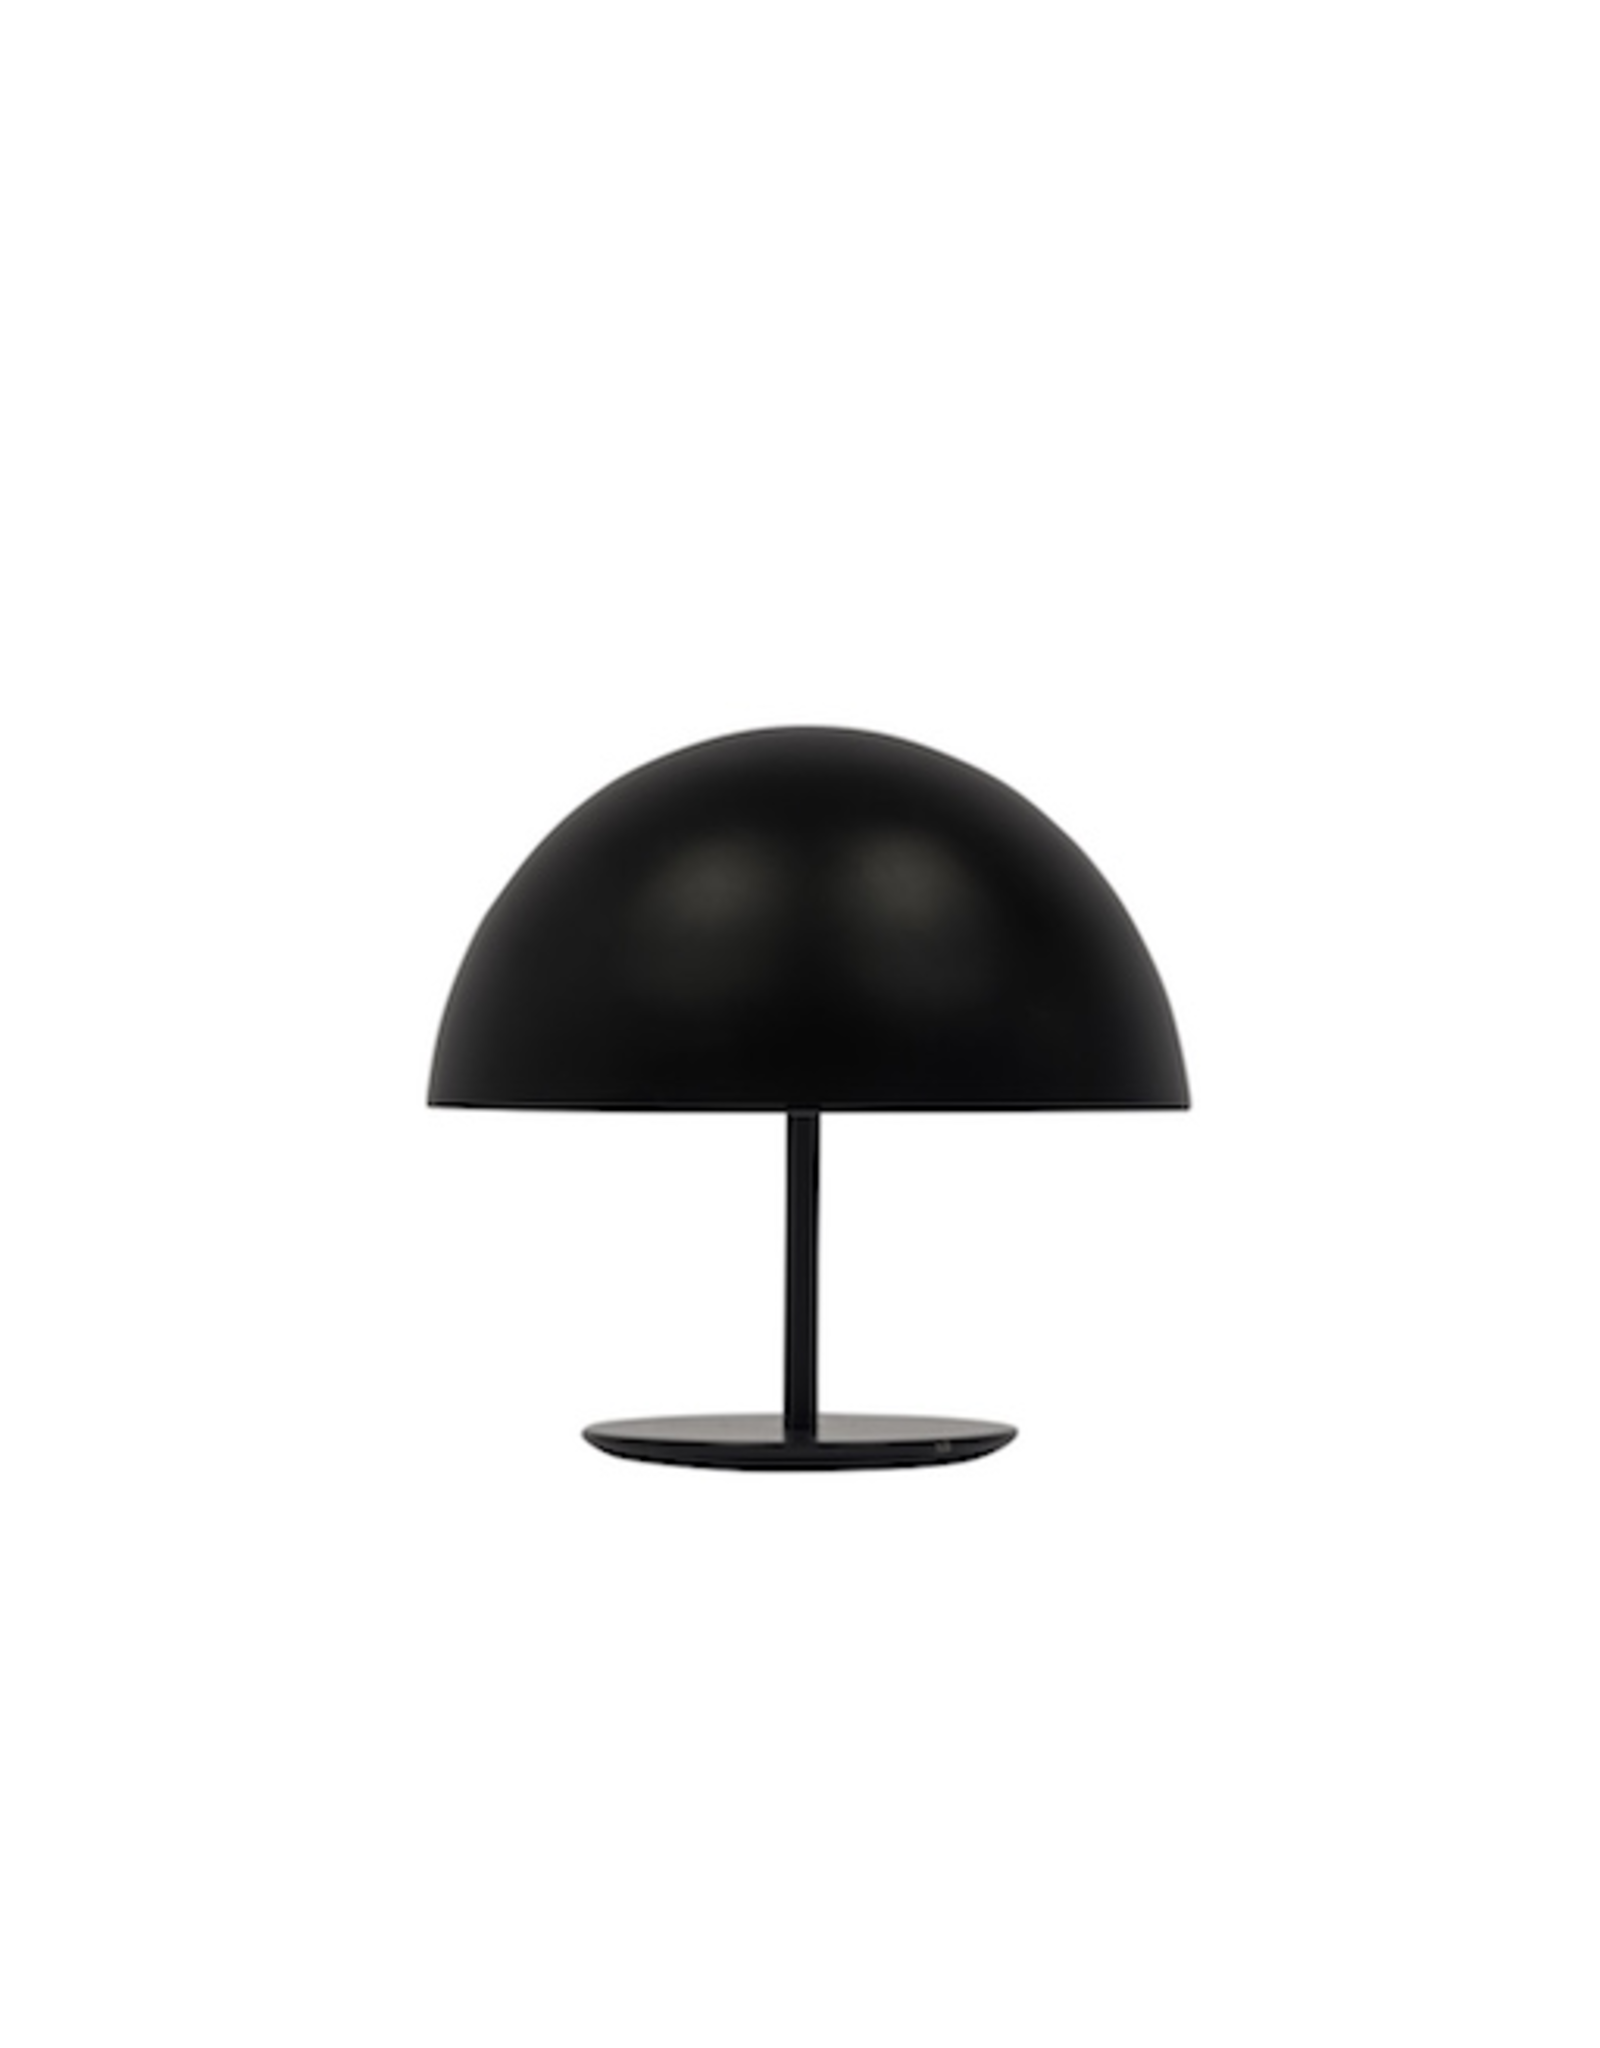 BABY DOME 黑色铝造台灯